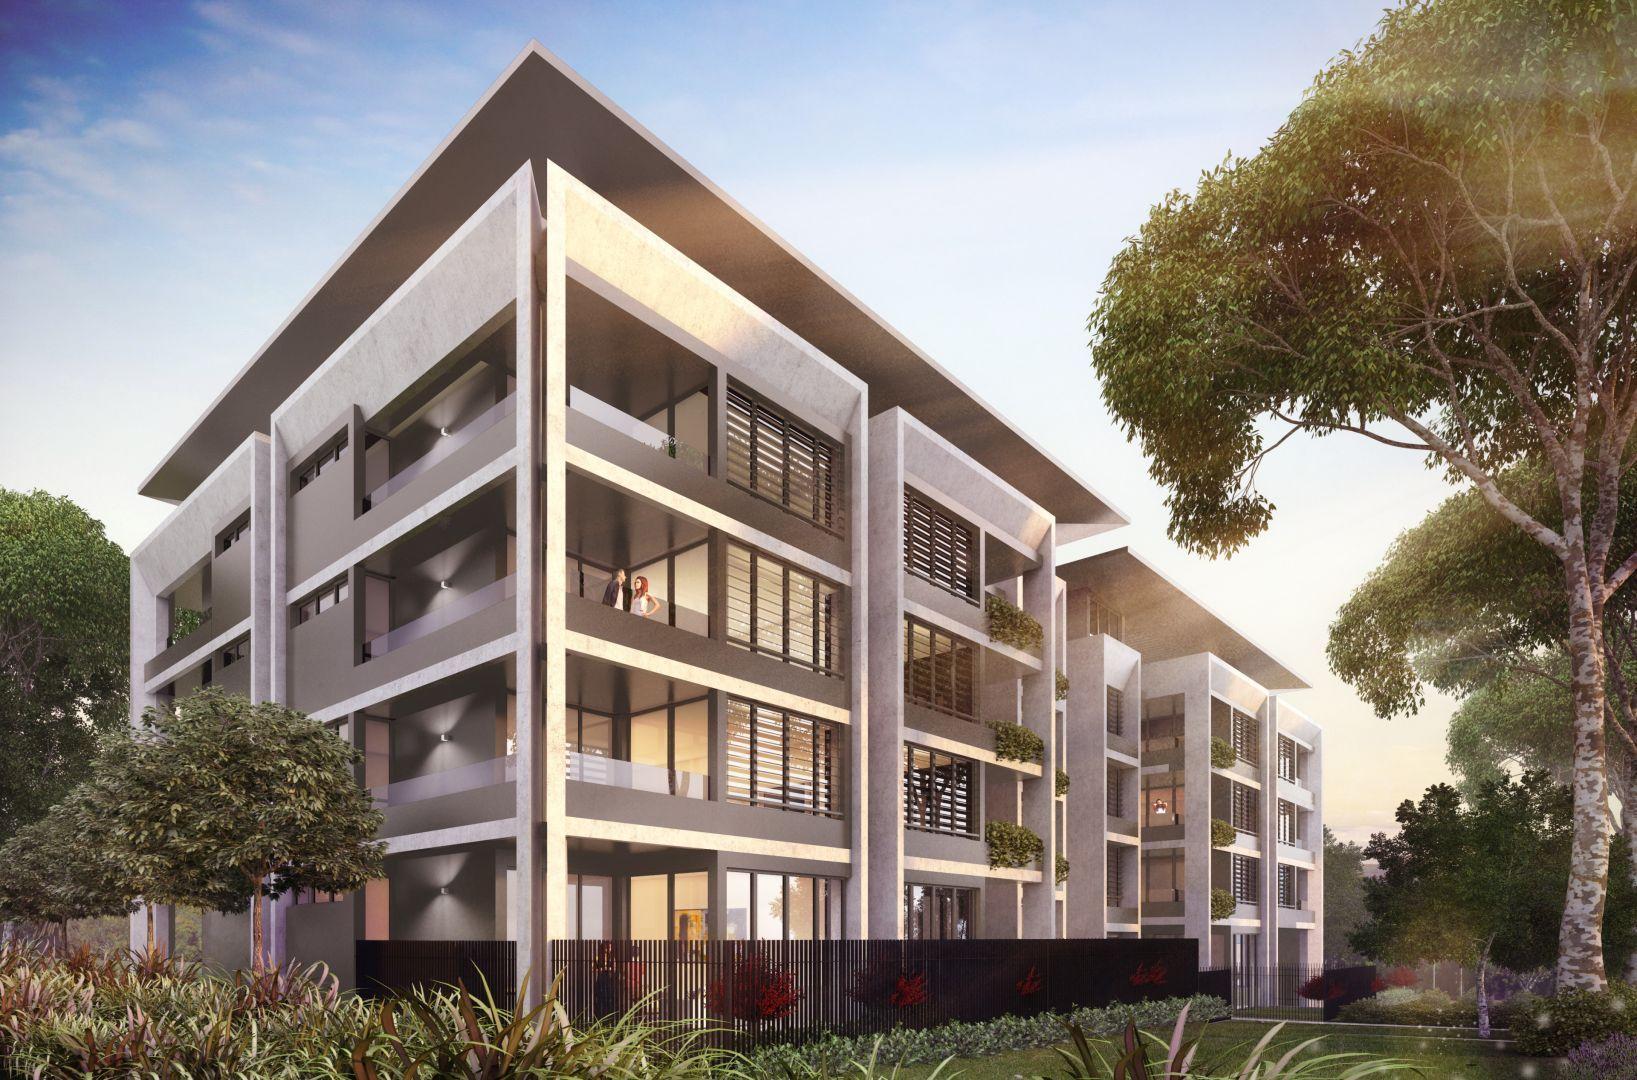 41/10-16 Gilroy Road, Turramurra NSW 2074, Image 0